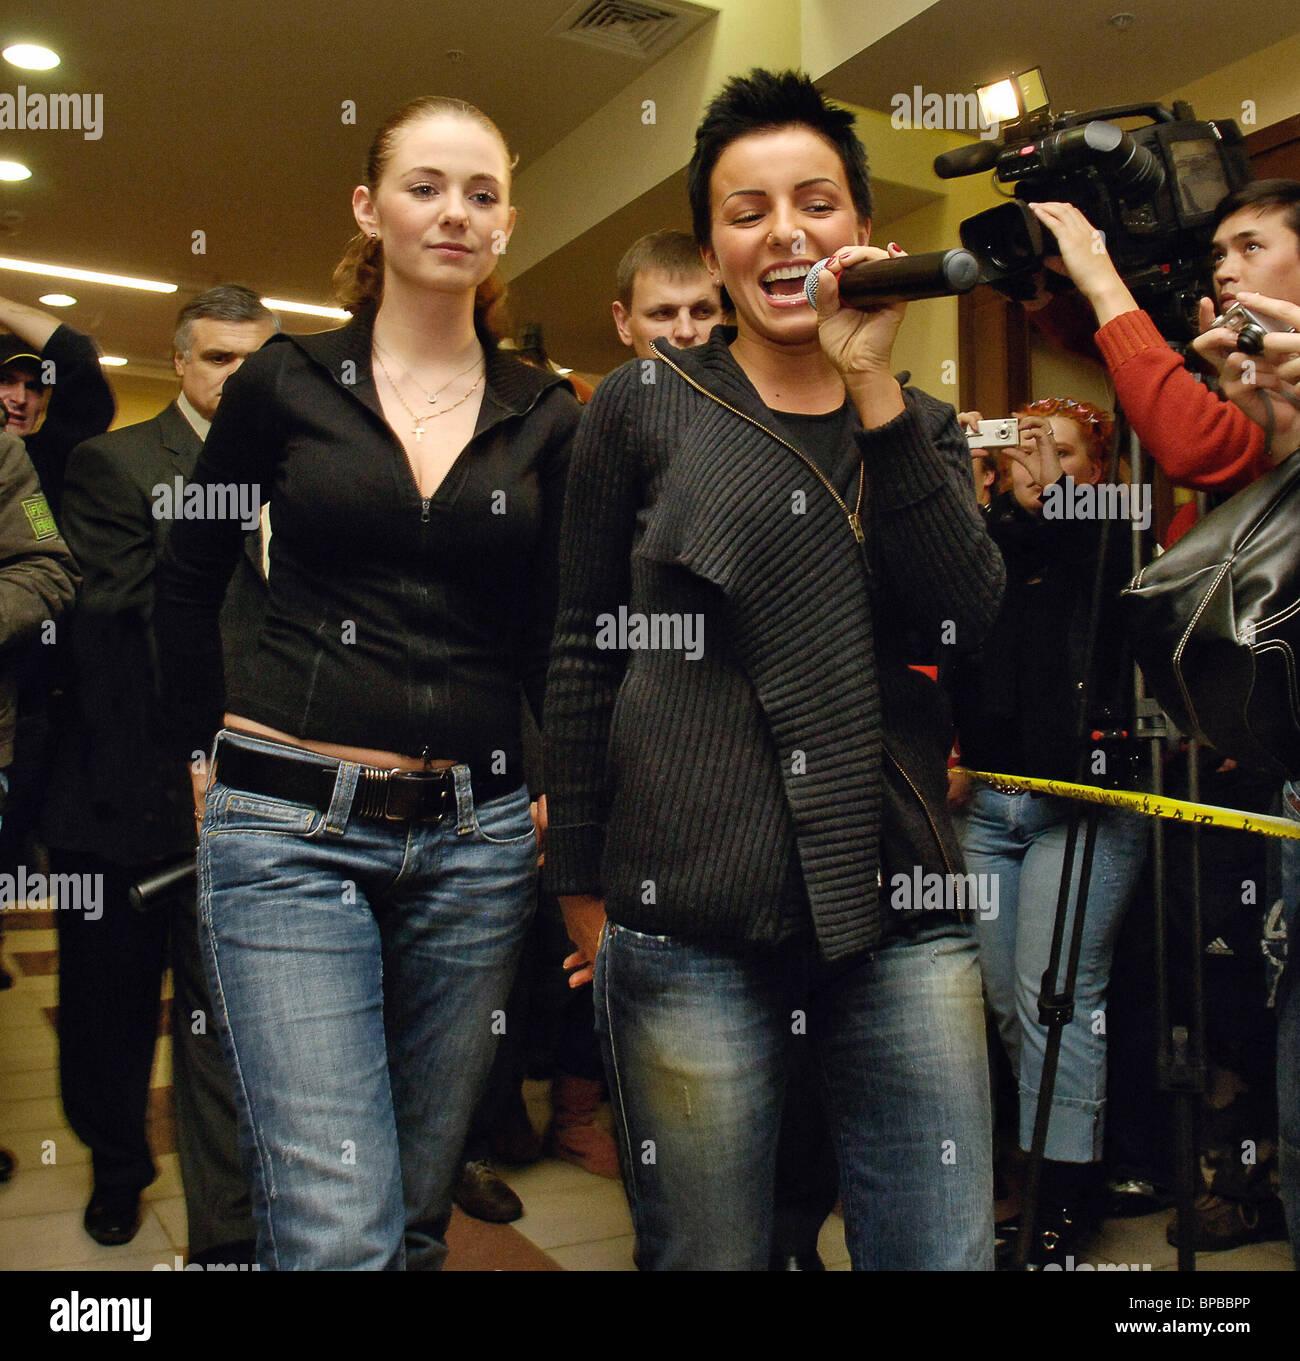 Tatu dúo pop de sesiones de autógrafos celebrada en Moscú Imagen De Stock